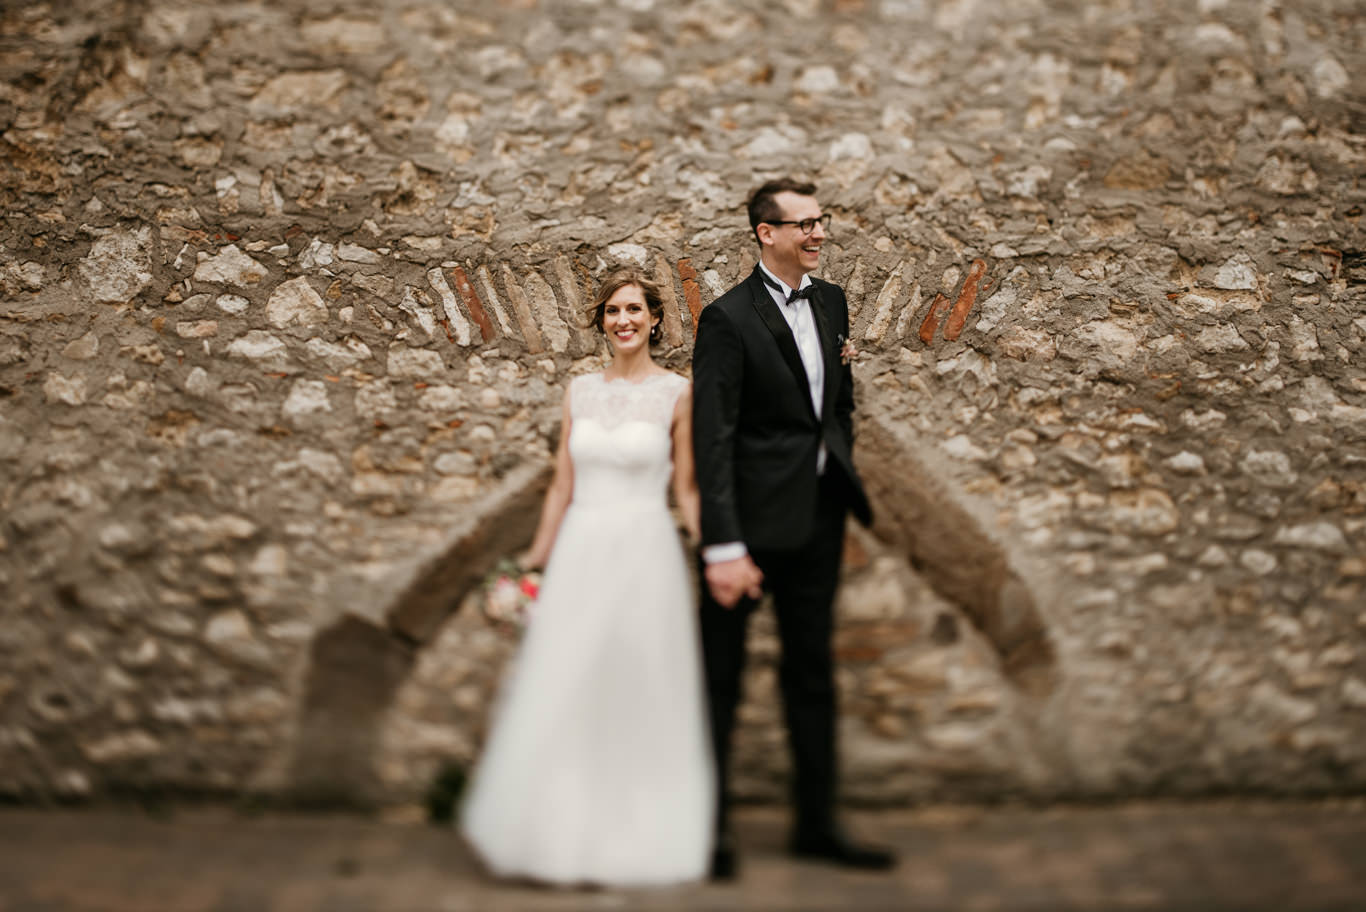 Hochzeit Schlossgut Lüll Luell Wachenheim Worms Hochzeitsfotograf First Look